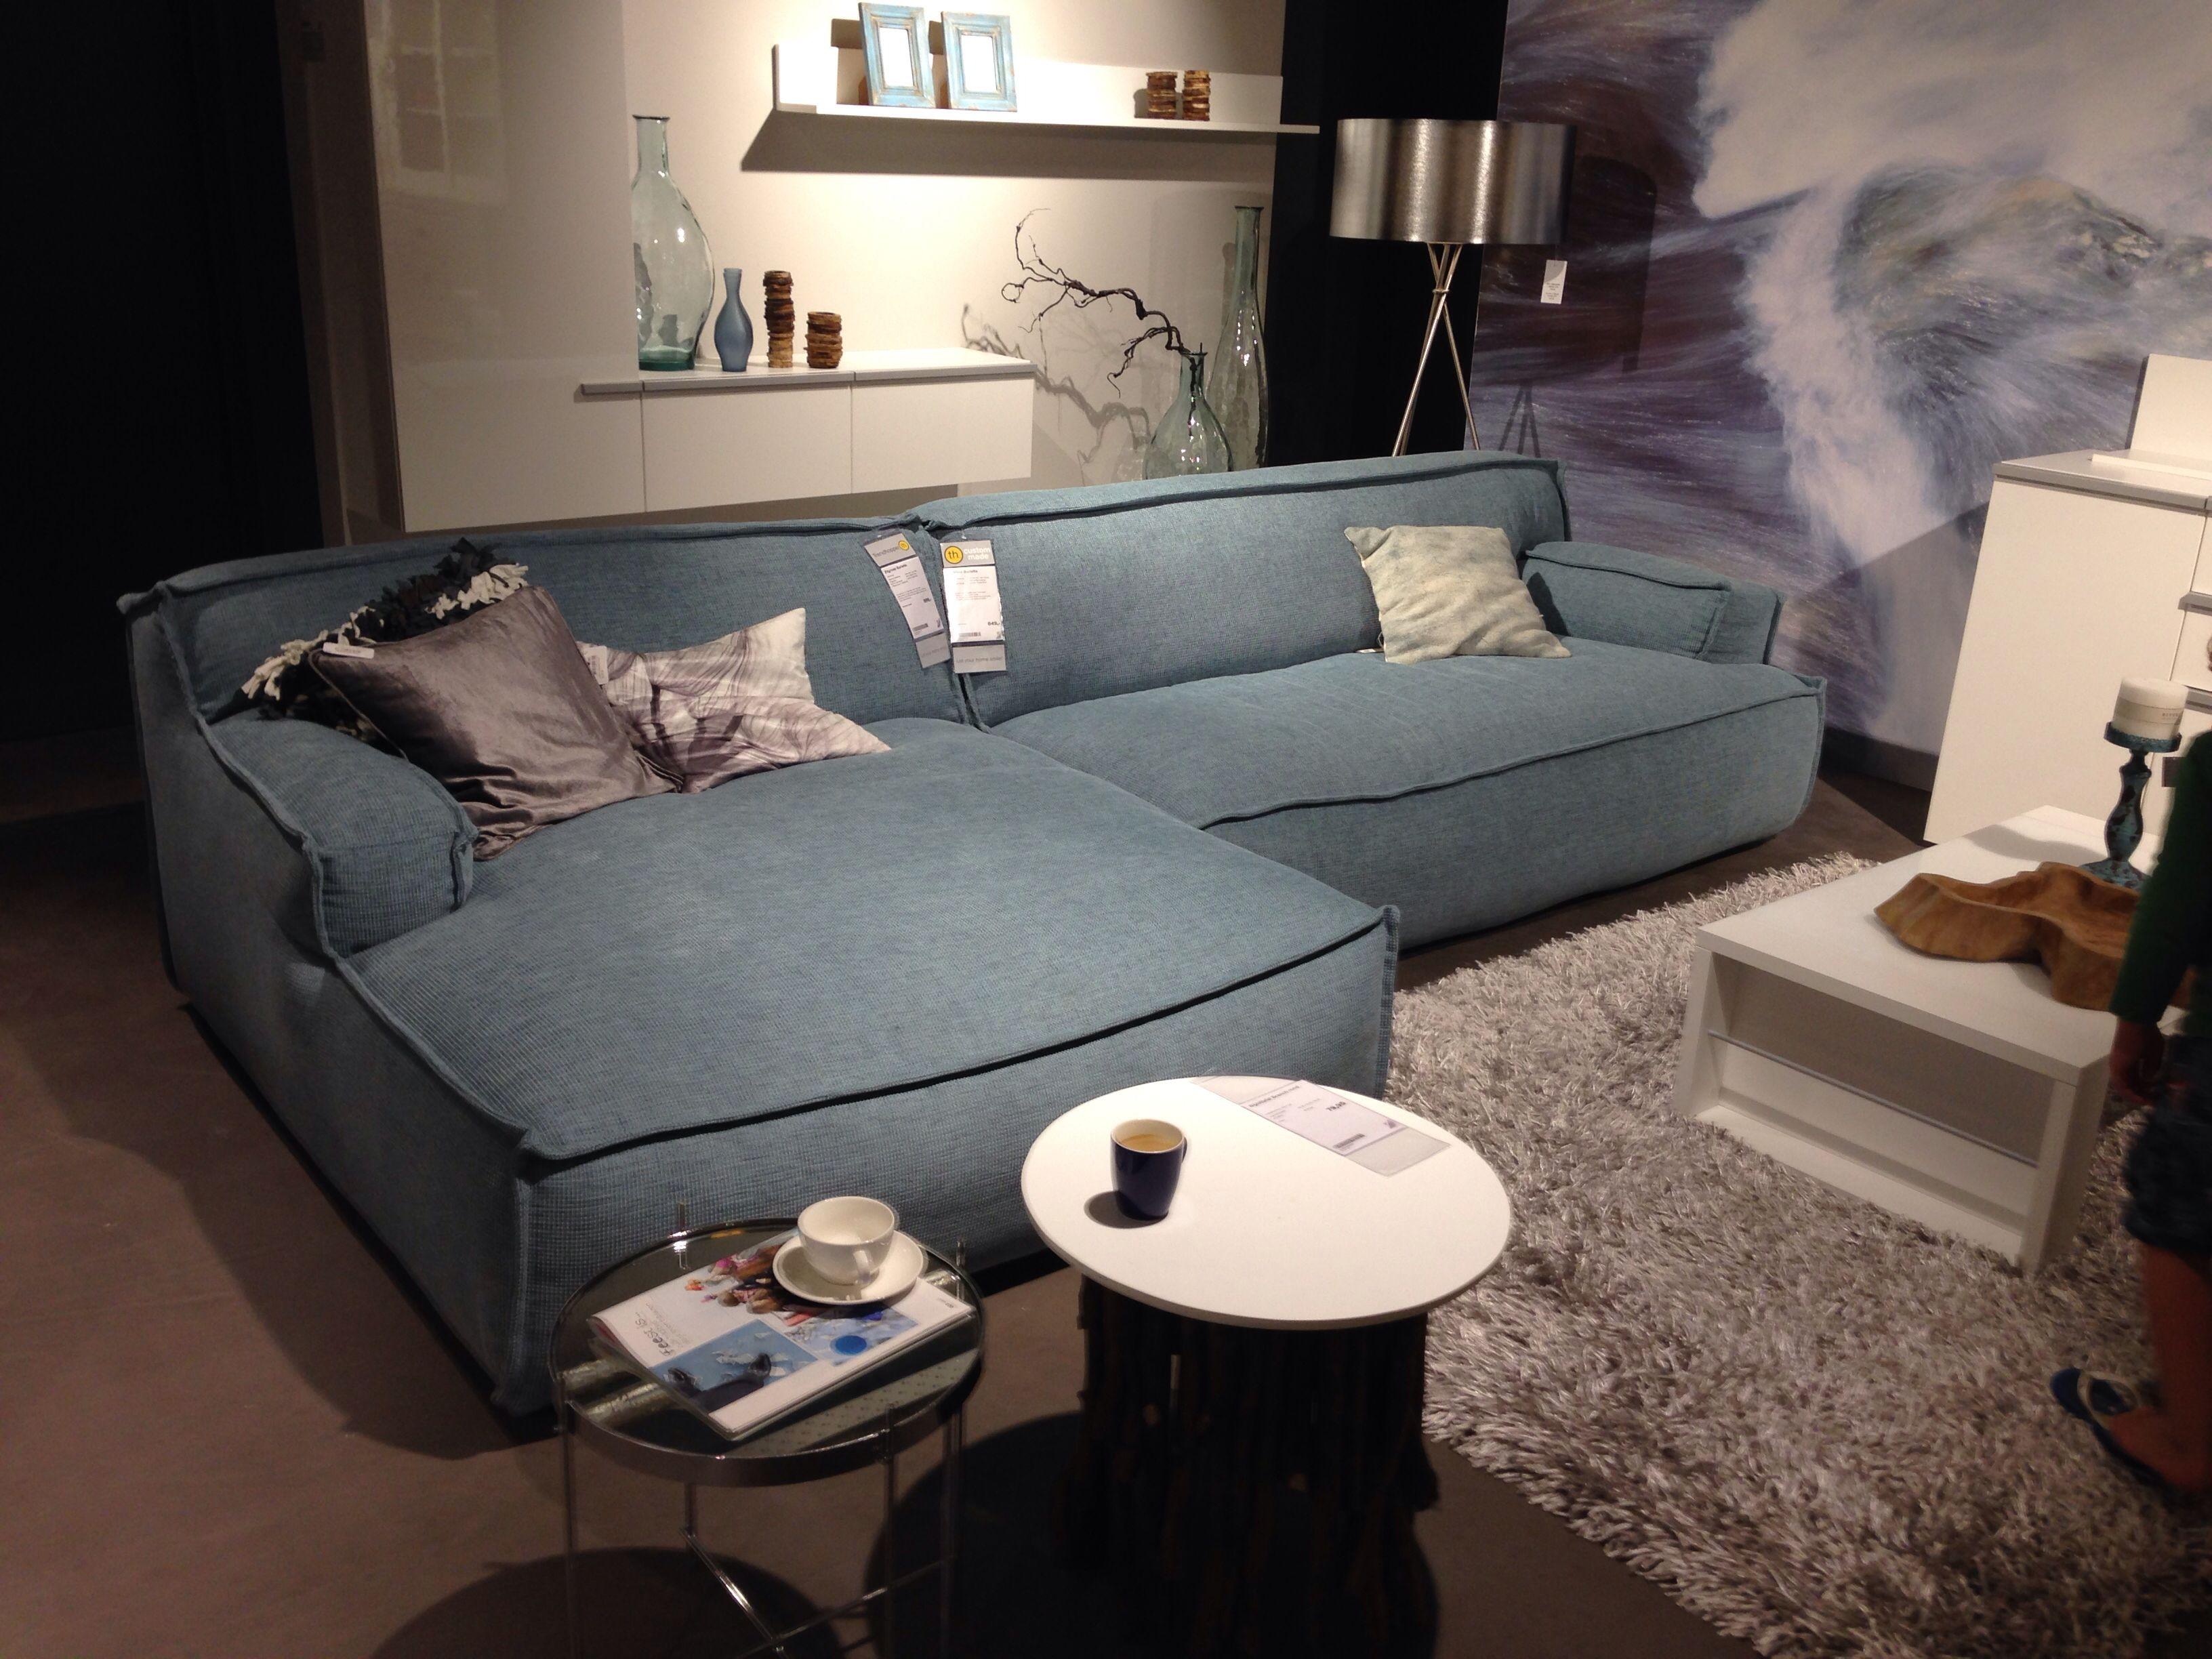 barletta sofa dfs sofas reviews bij trendhopper nice bank pinterest and couch